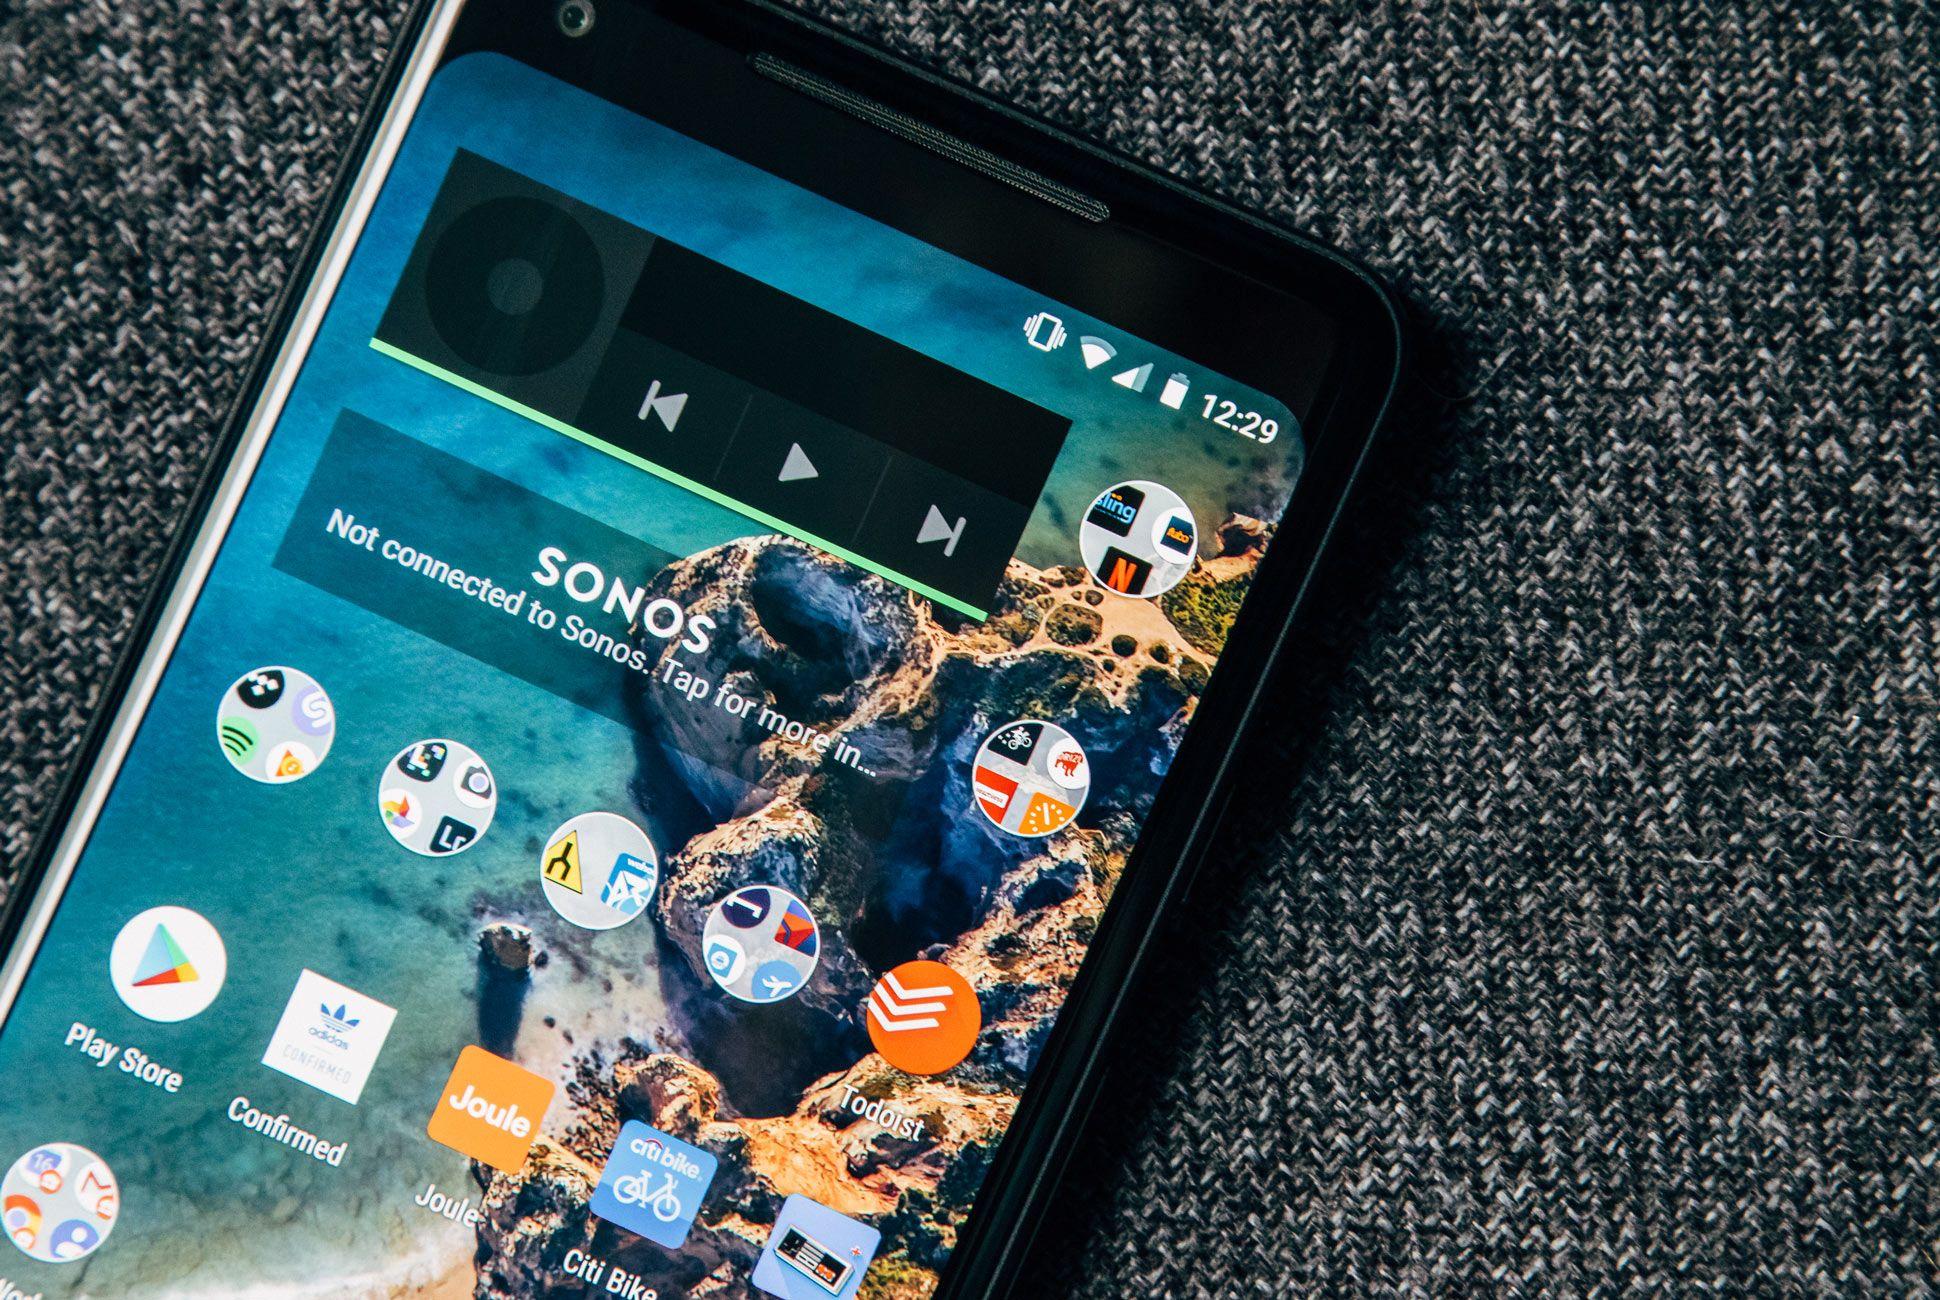 Google-Pixel-2-XL-Review-Gear-Patrol-Slide-4